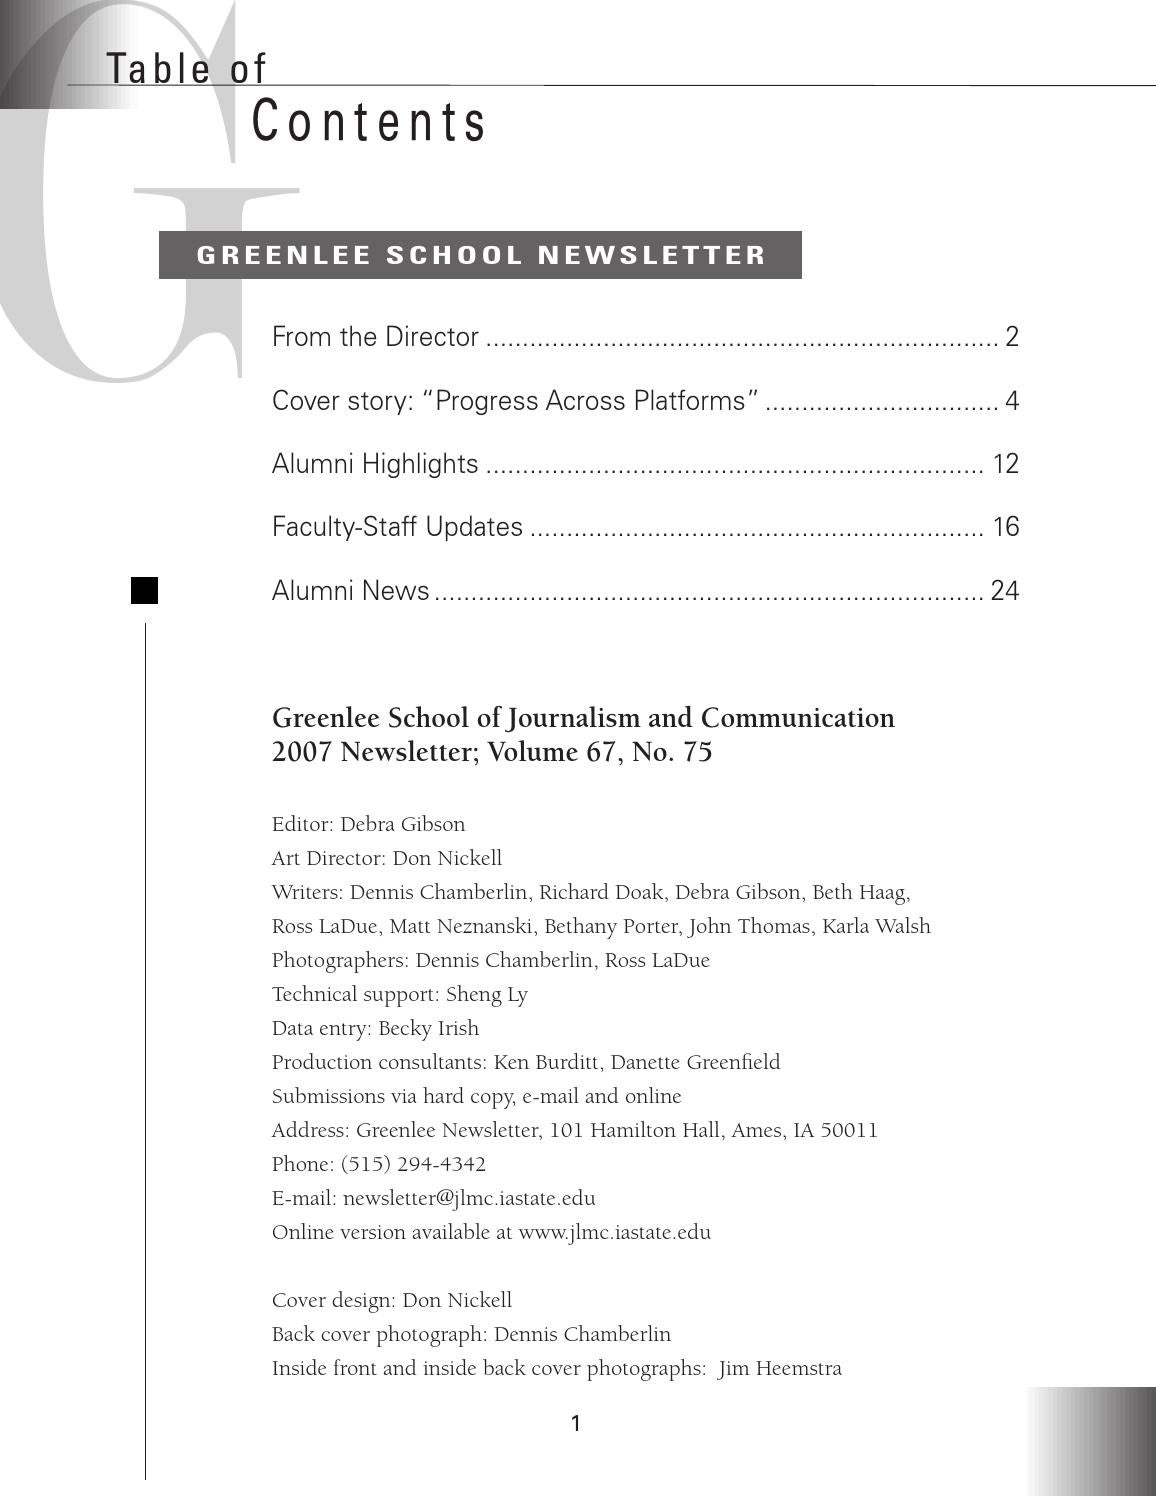 2007 Greenlee Newsletter by Greenlee School of Journalism and ...